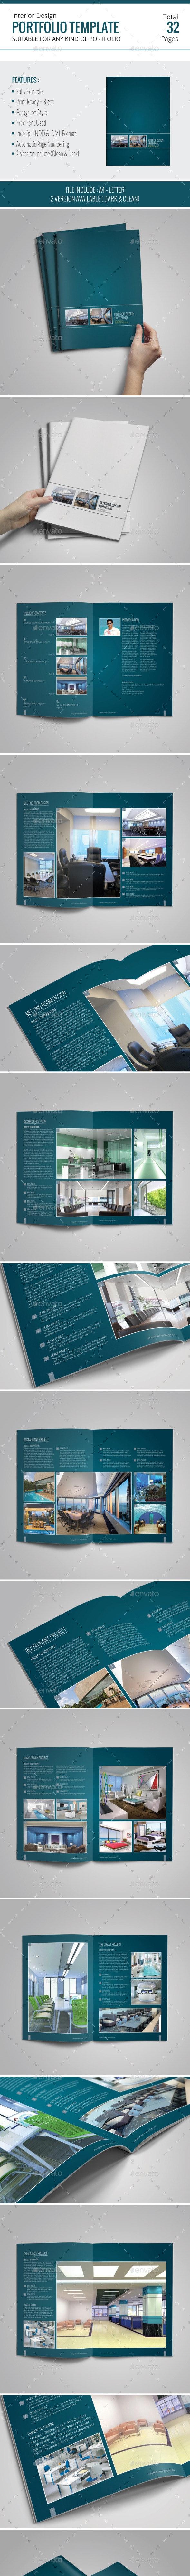 Interior Design Portfolio Template - Portfolio Brochures